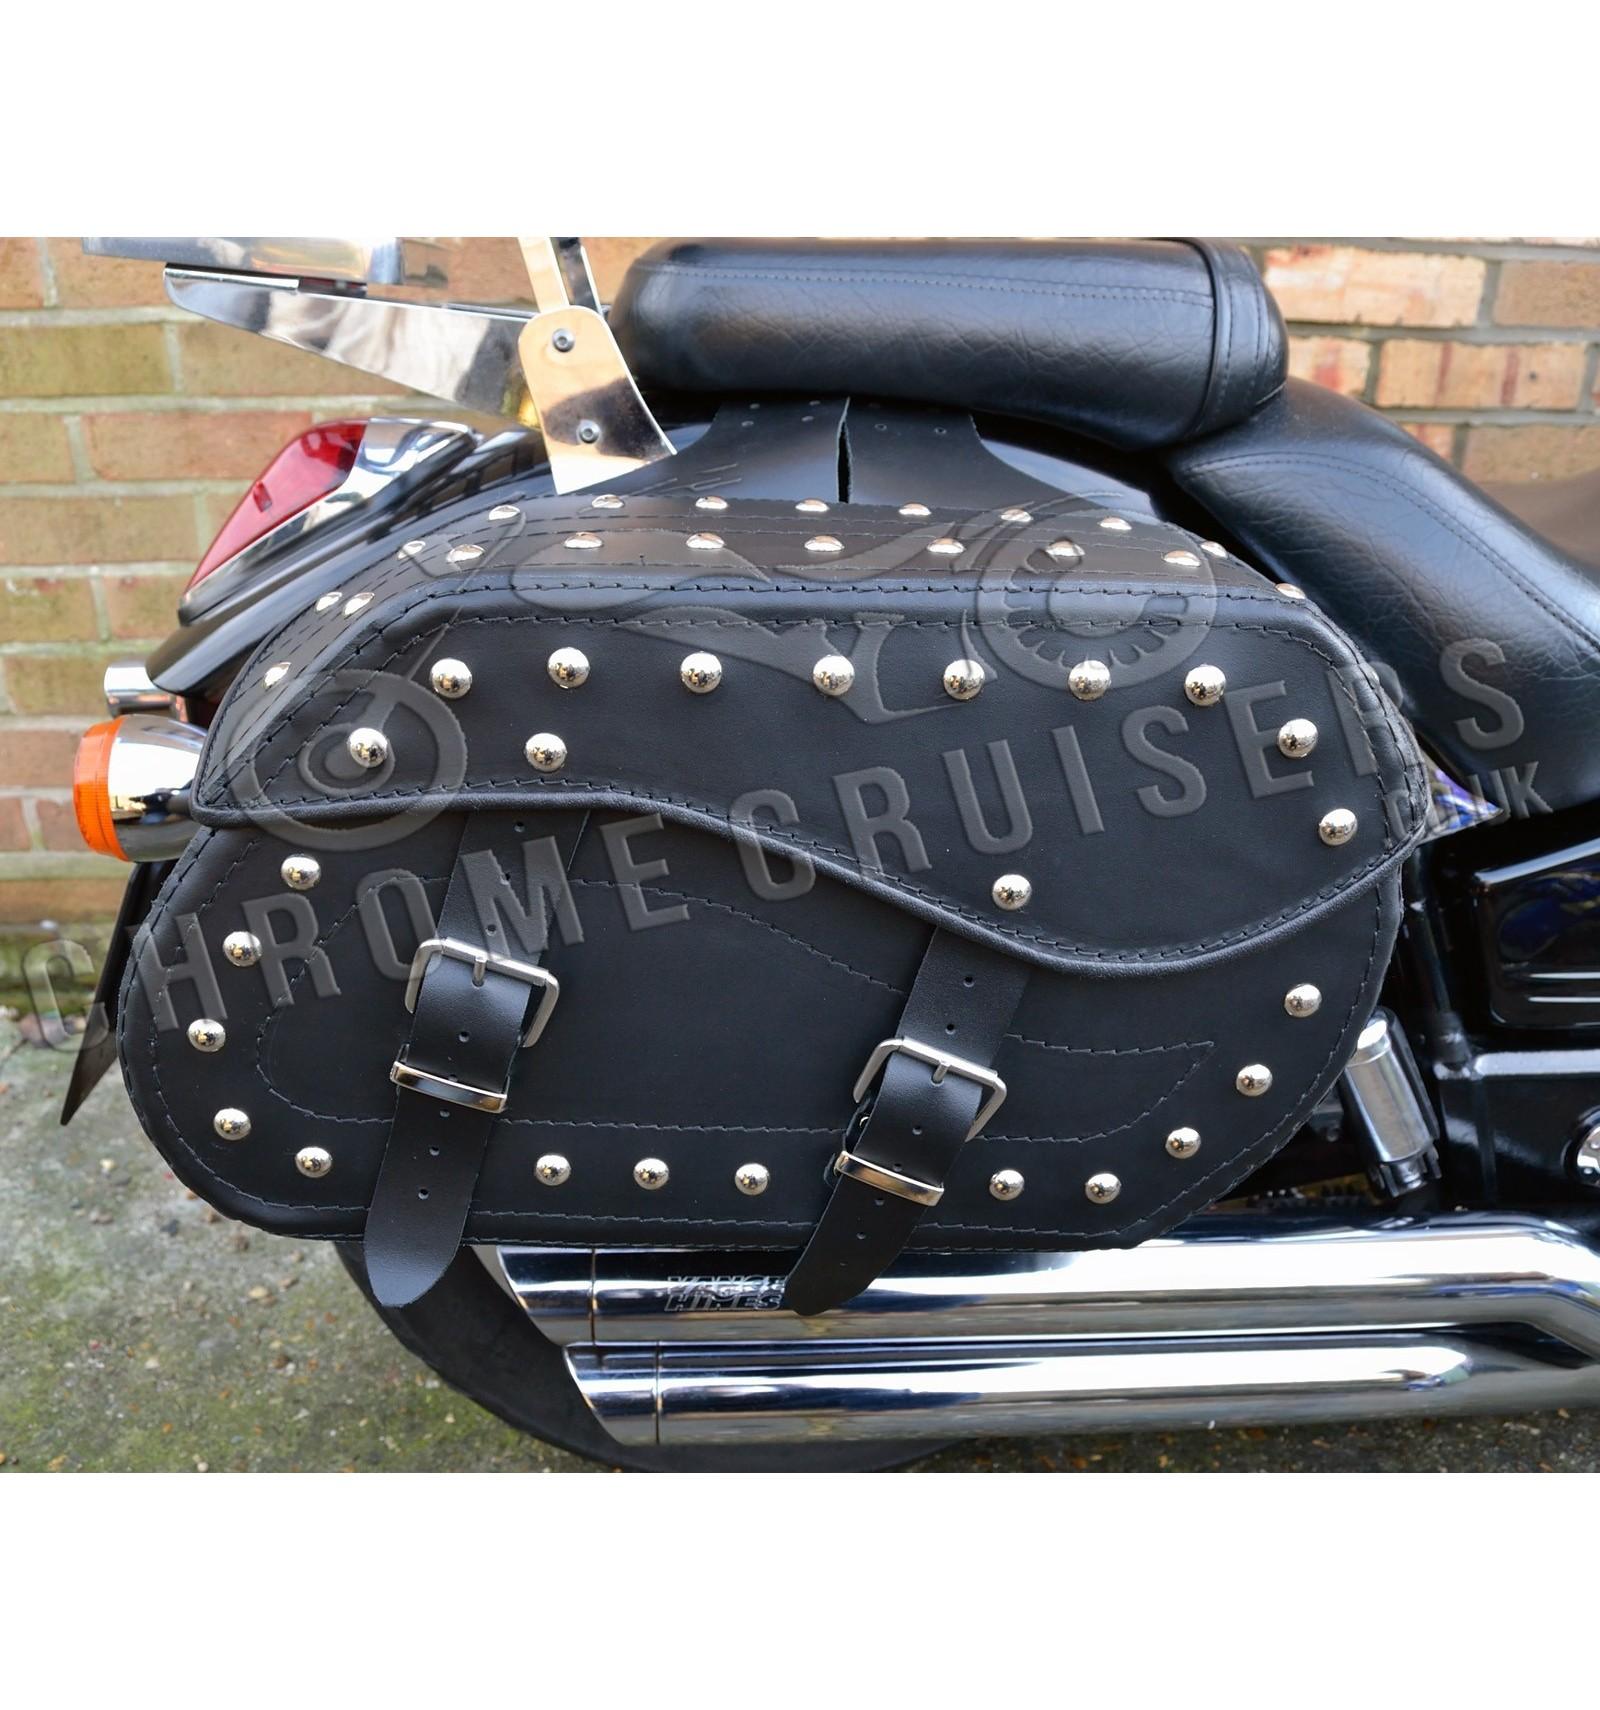 Motorcycle Leather Saddlebag Pair C12b Chrome Cruisers